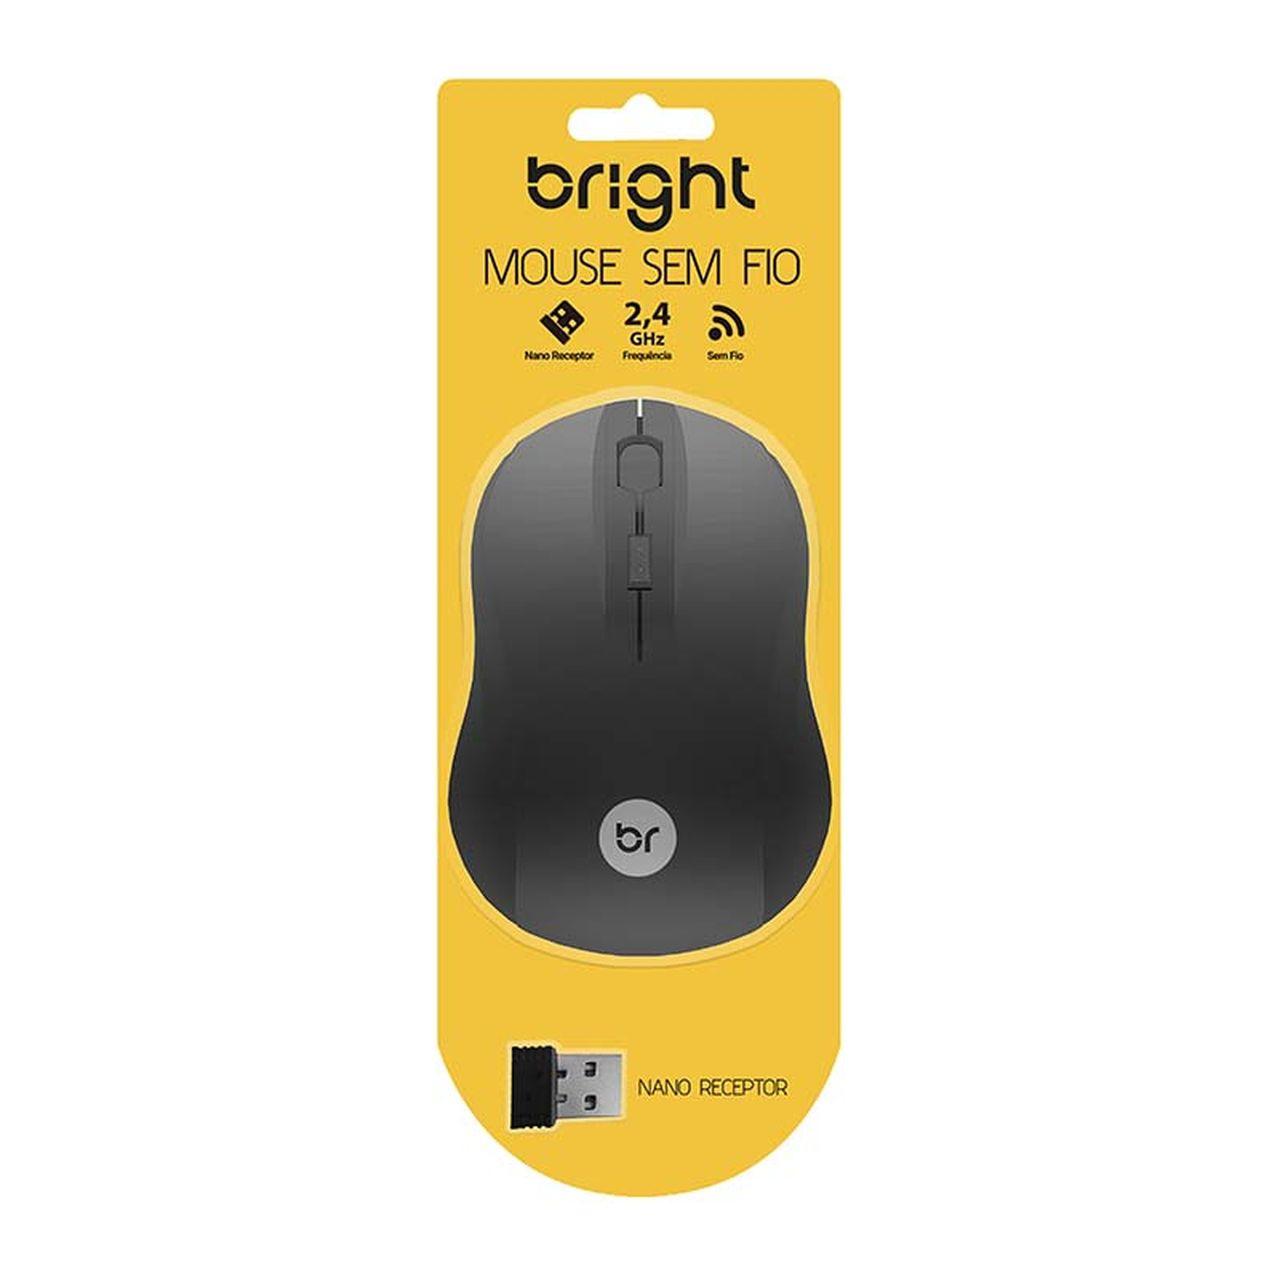 Mouse Sem Fio Escocia Usb 2.4 Ghz Bright Preto - 0095